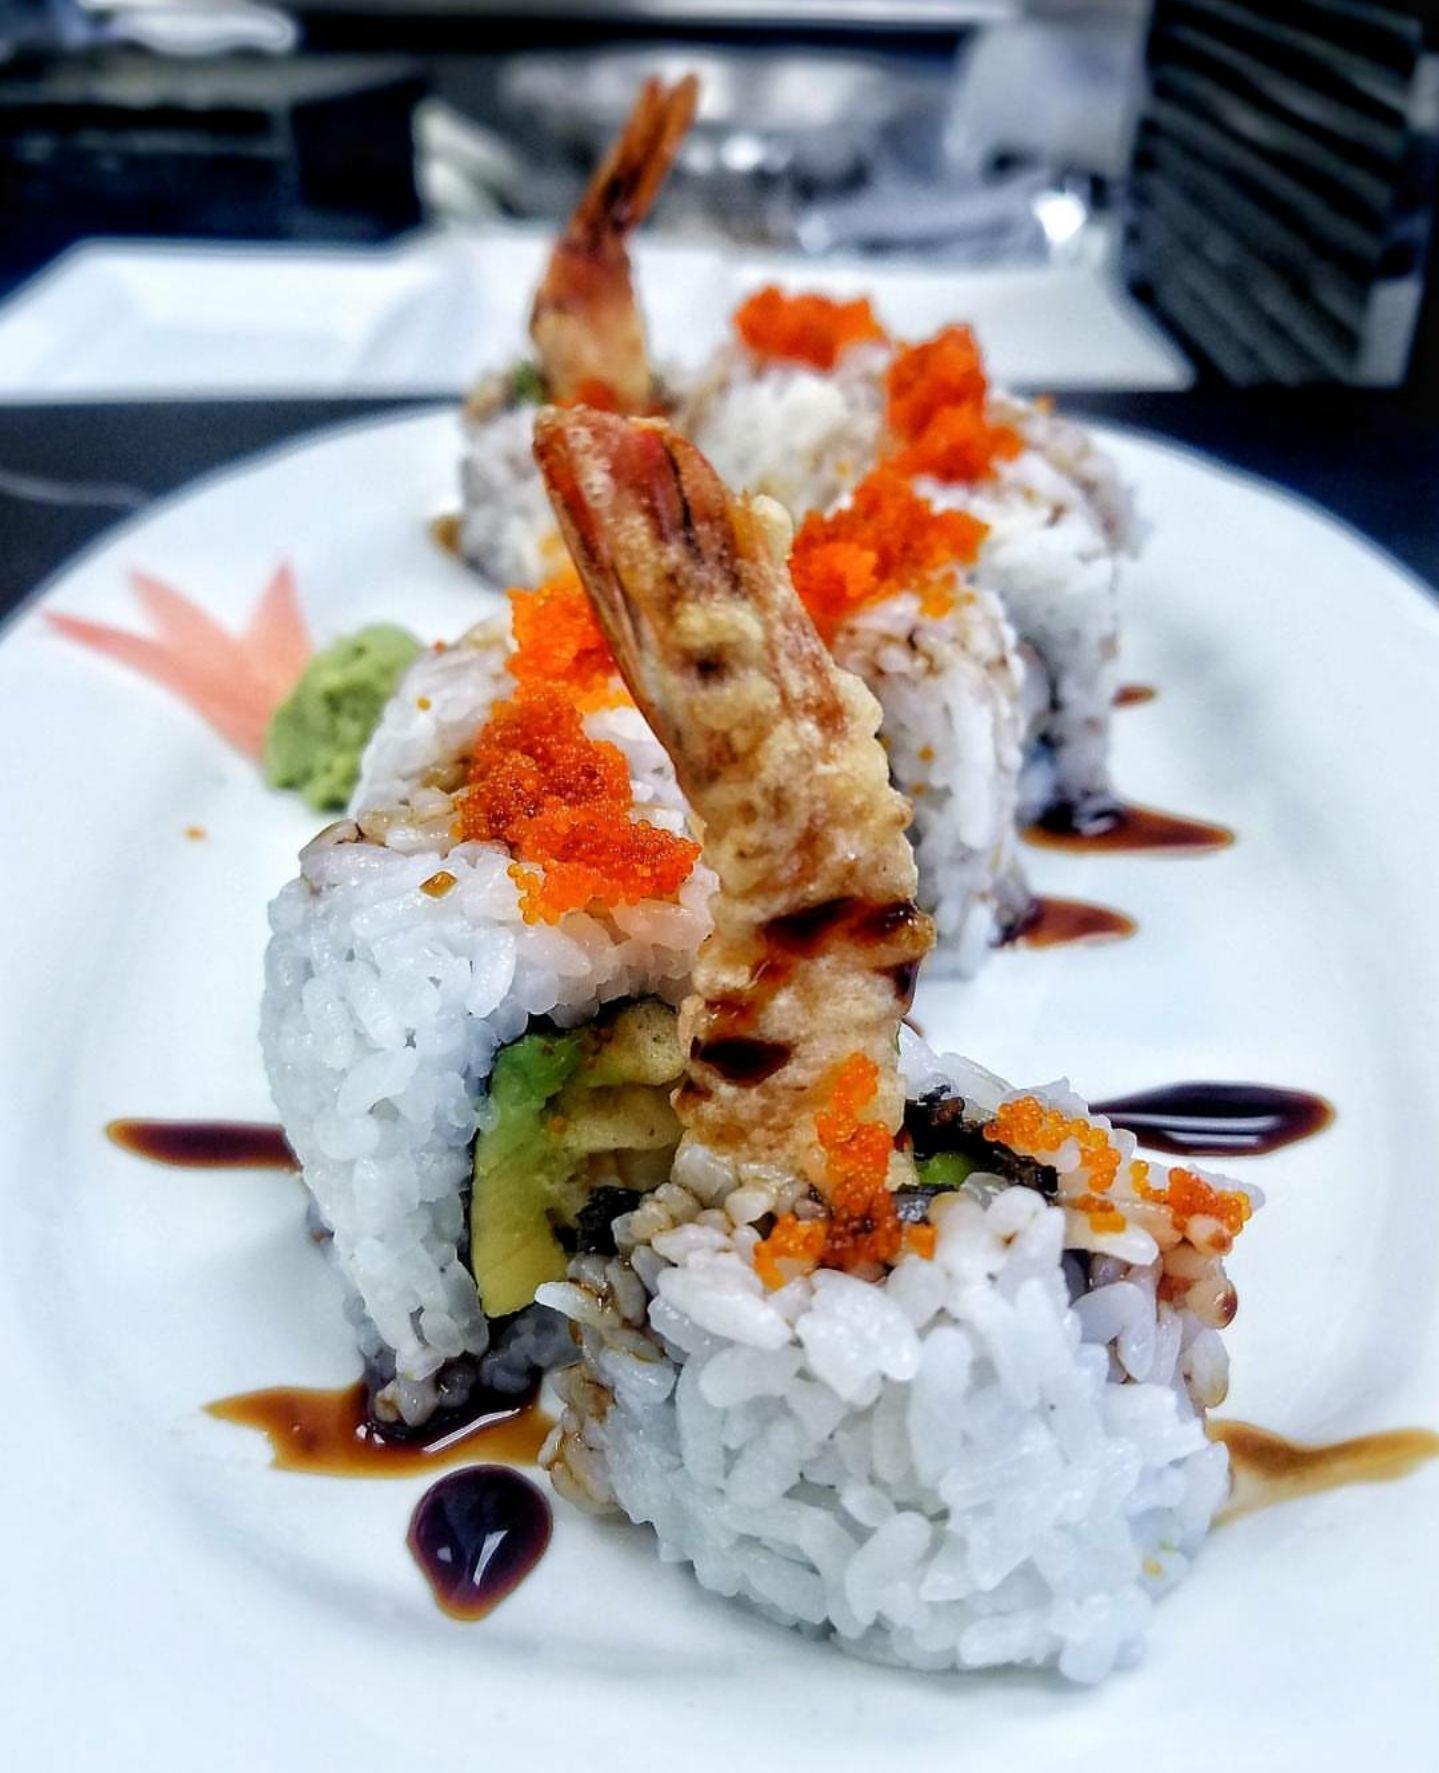 Ricetta Sushi In Tempura.Shrimp Tempura Uramaki Sushi Food Foodporn Japanese Japan Dinner Sashimi Yummy Foodie Lunch Yum